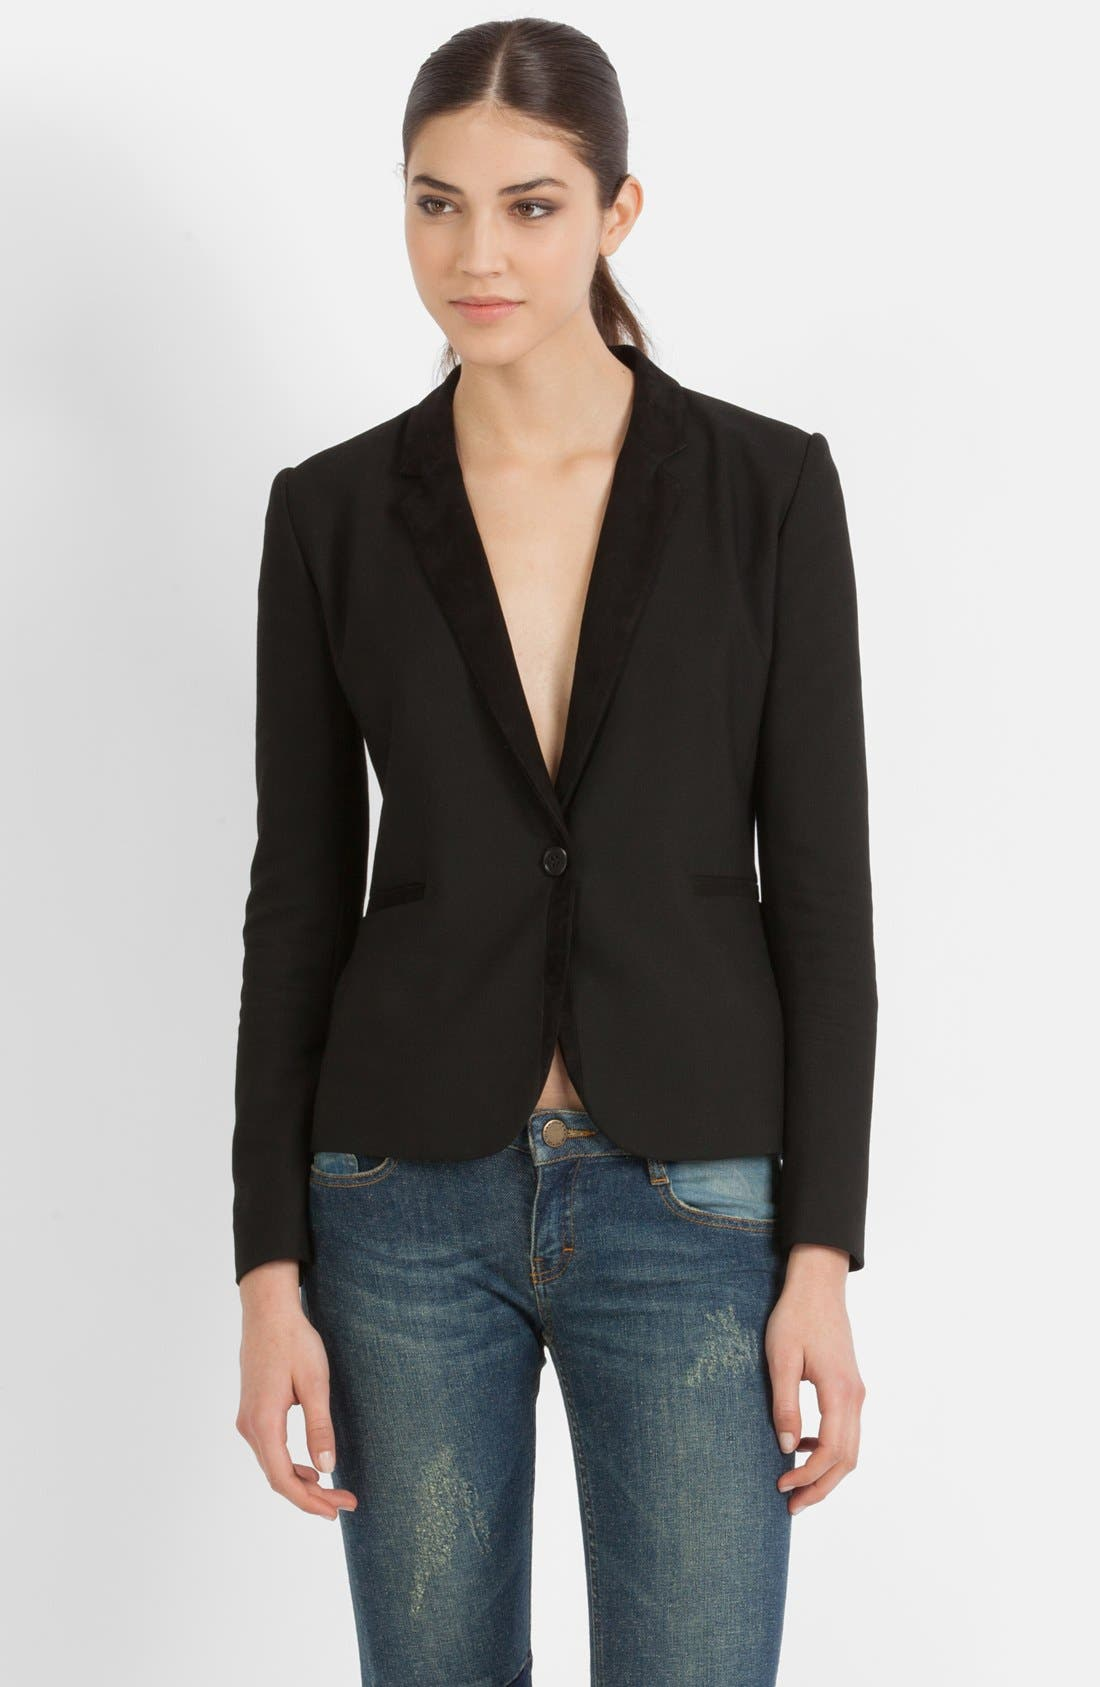 Alternate Image 1 Selected - maje 'Veste Cintree' Leather Accent Blazer